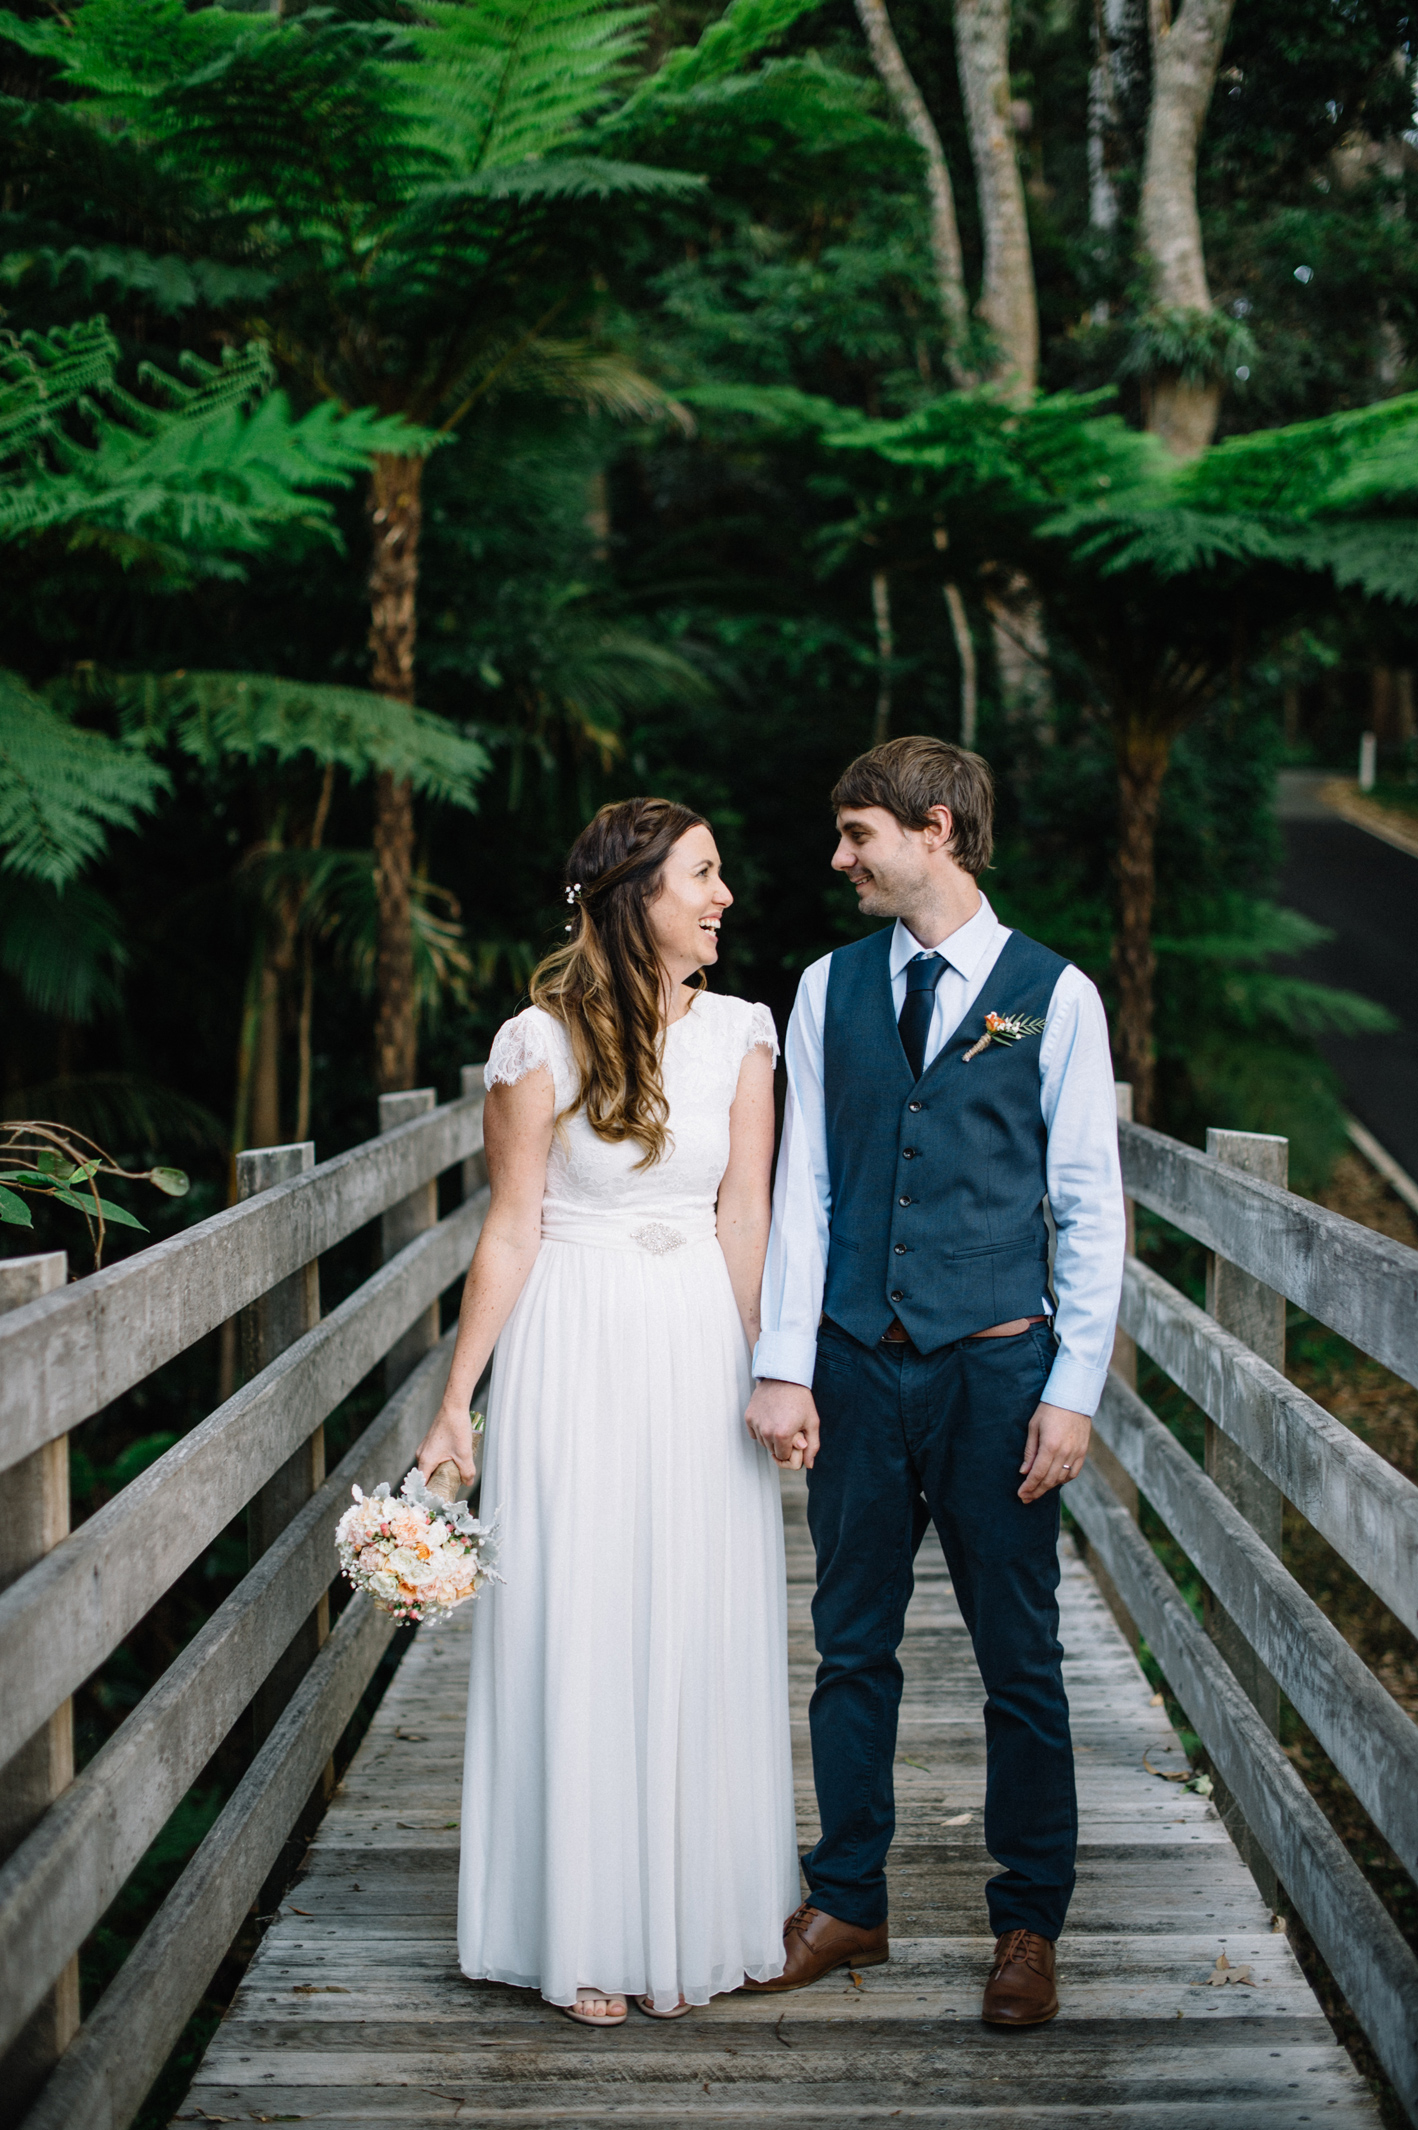 047-michelle-reagan-mount-tamborine-wedding-sophie-baker-photography